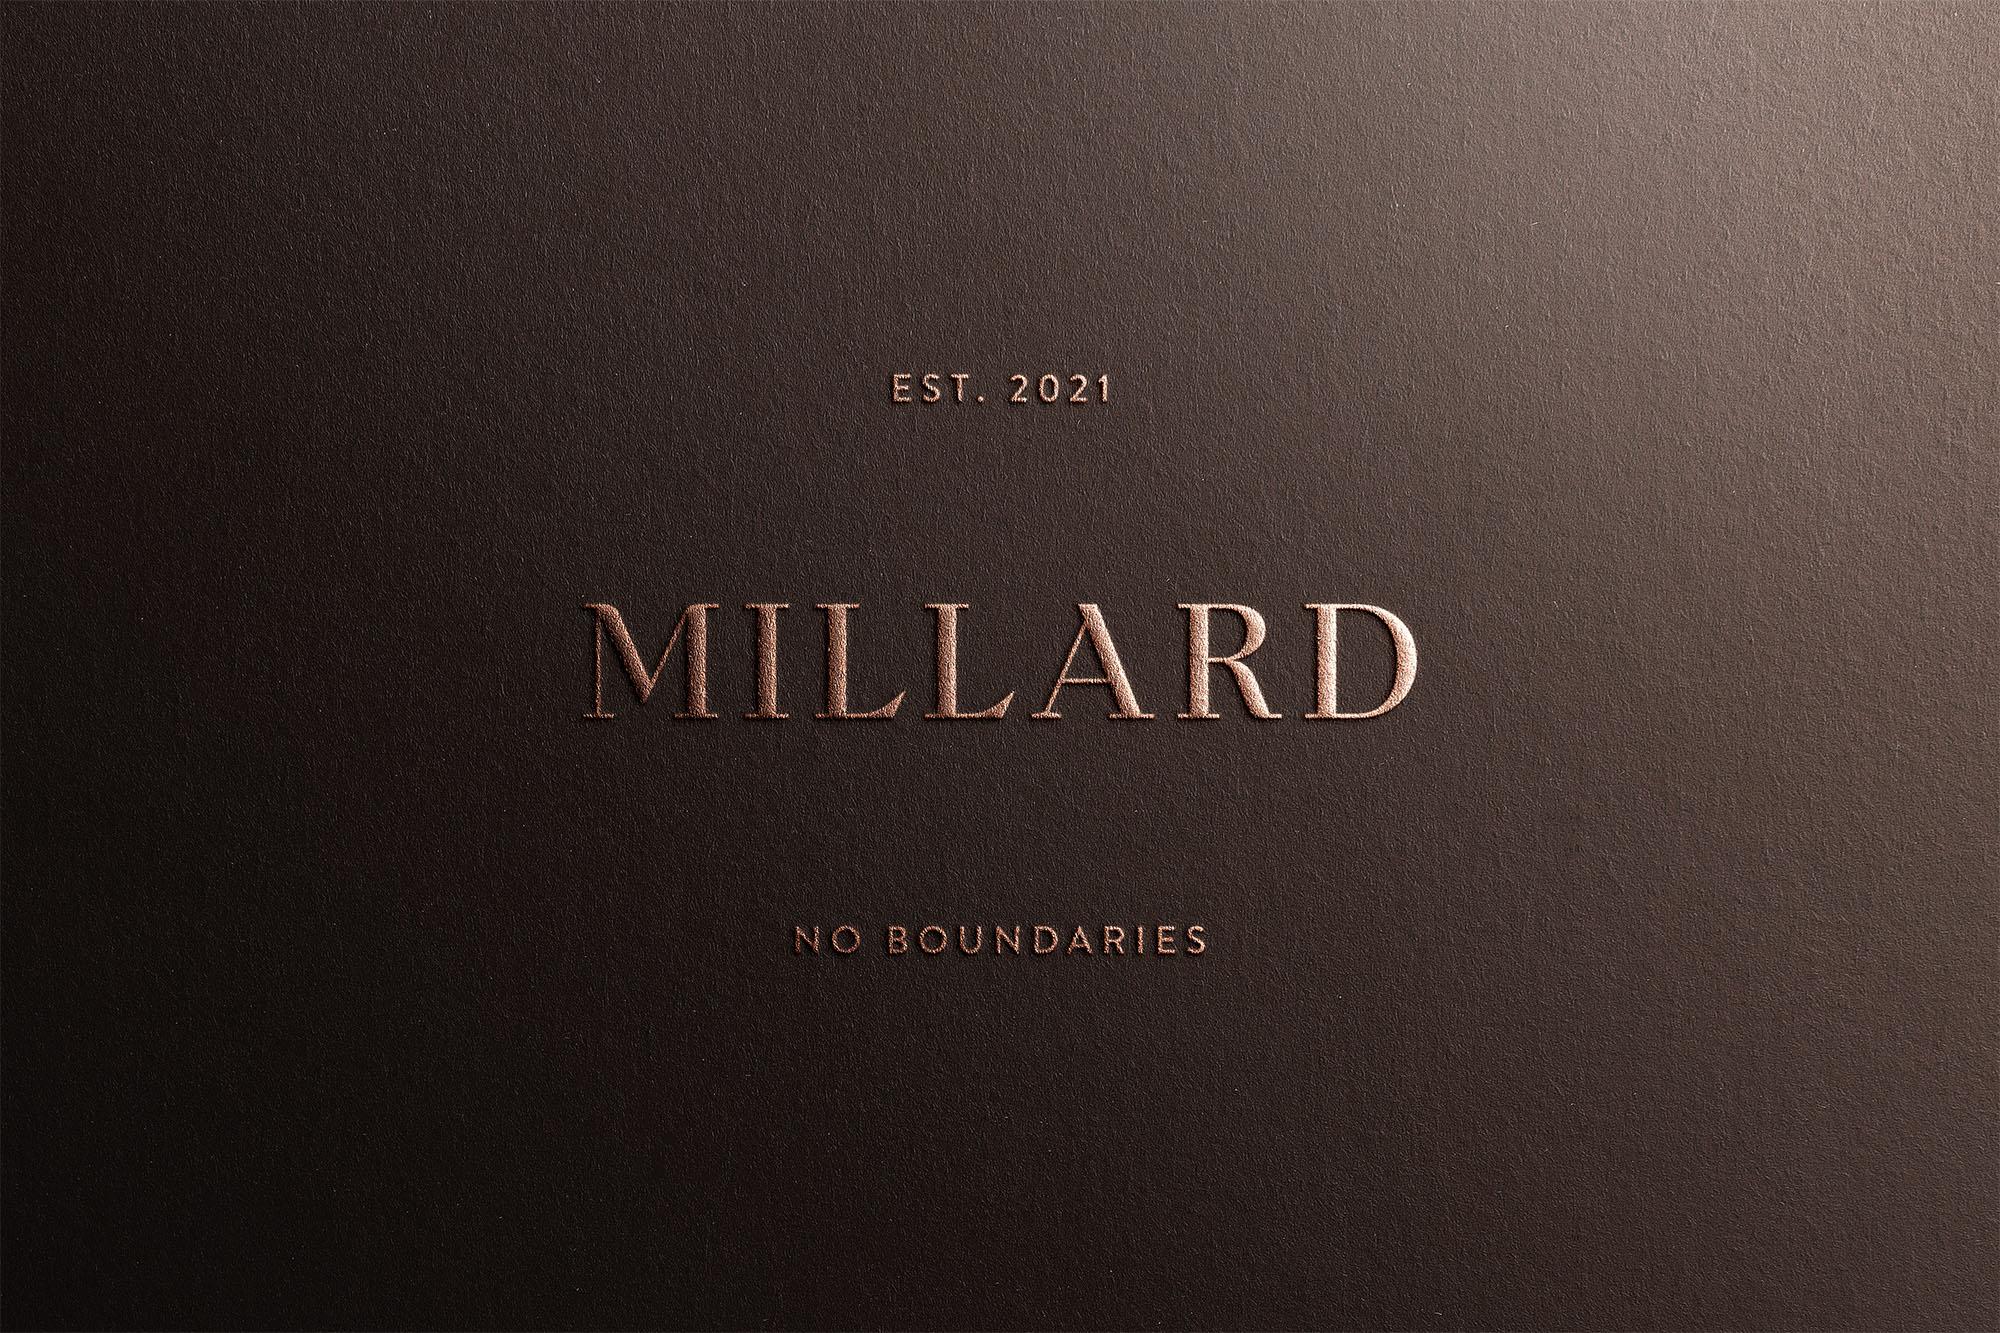 Widarto Impact Creates Millard Sarong Identity Design